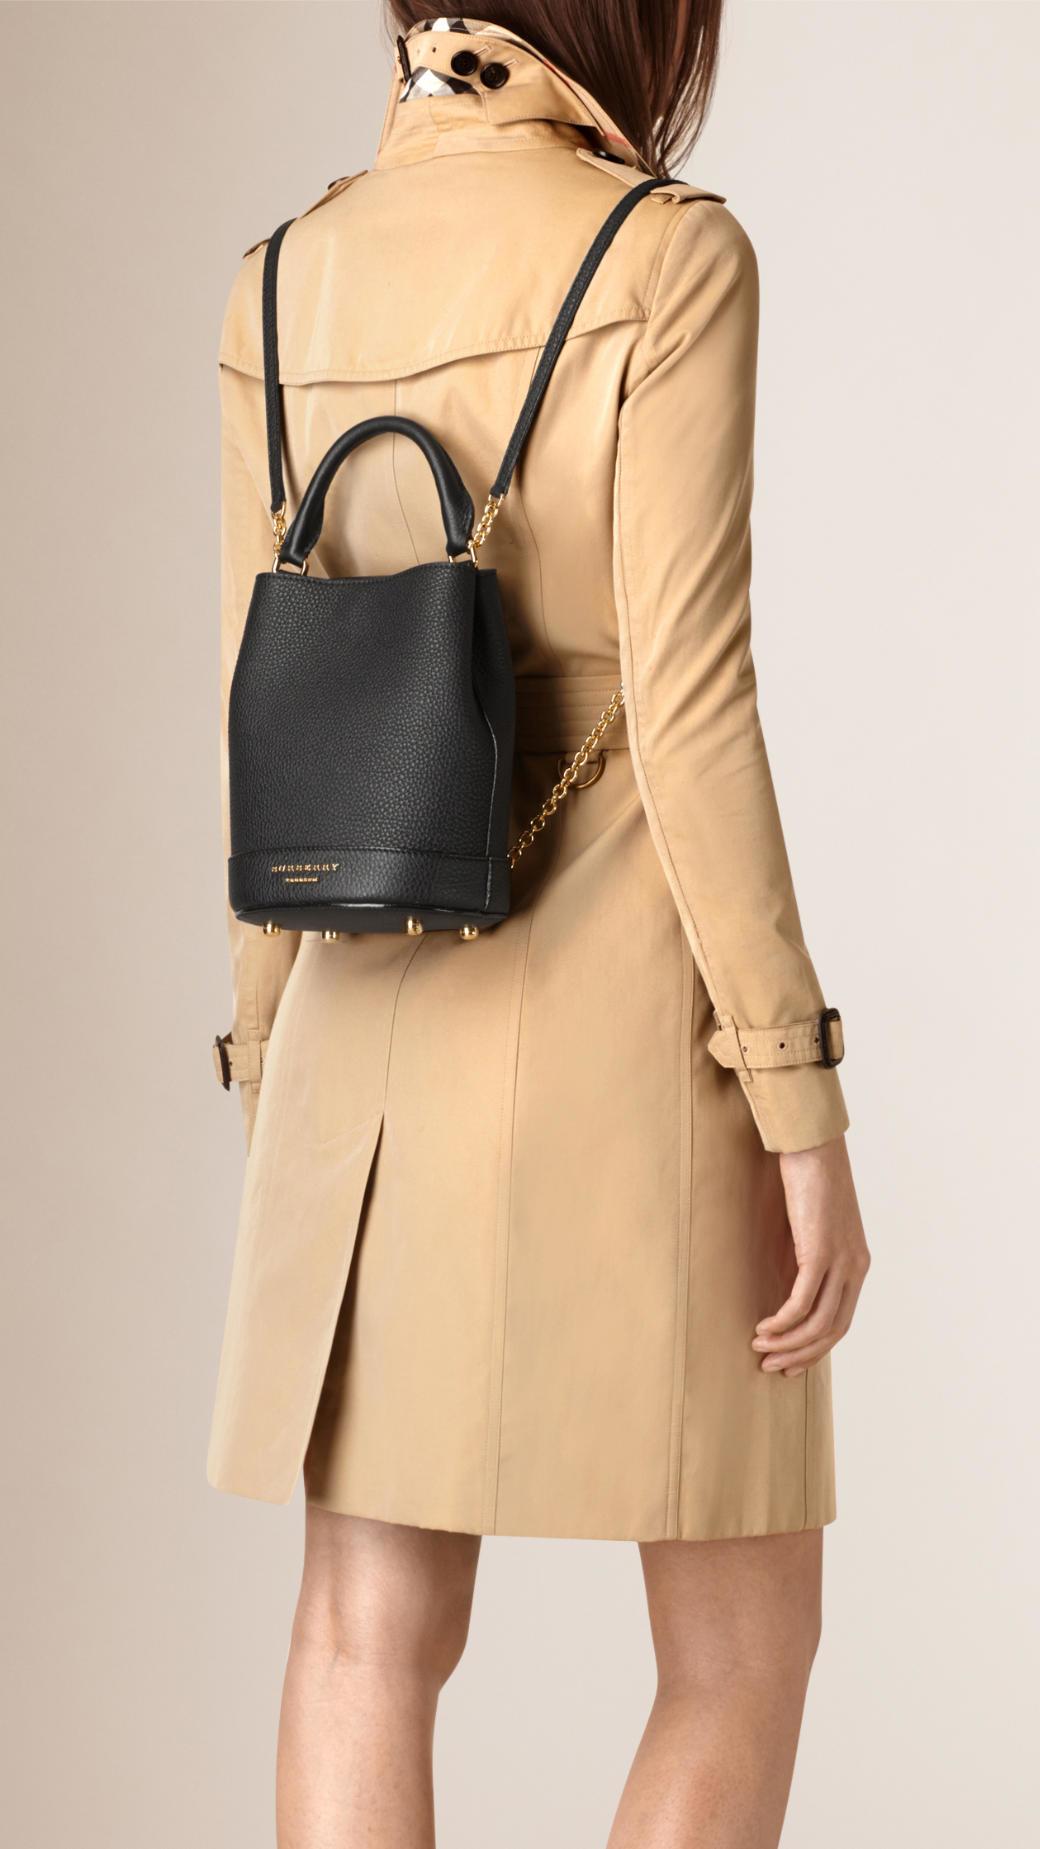 Burberry Backpack Medium